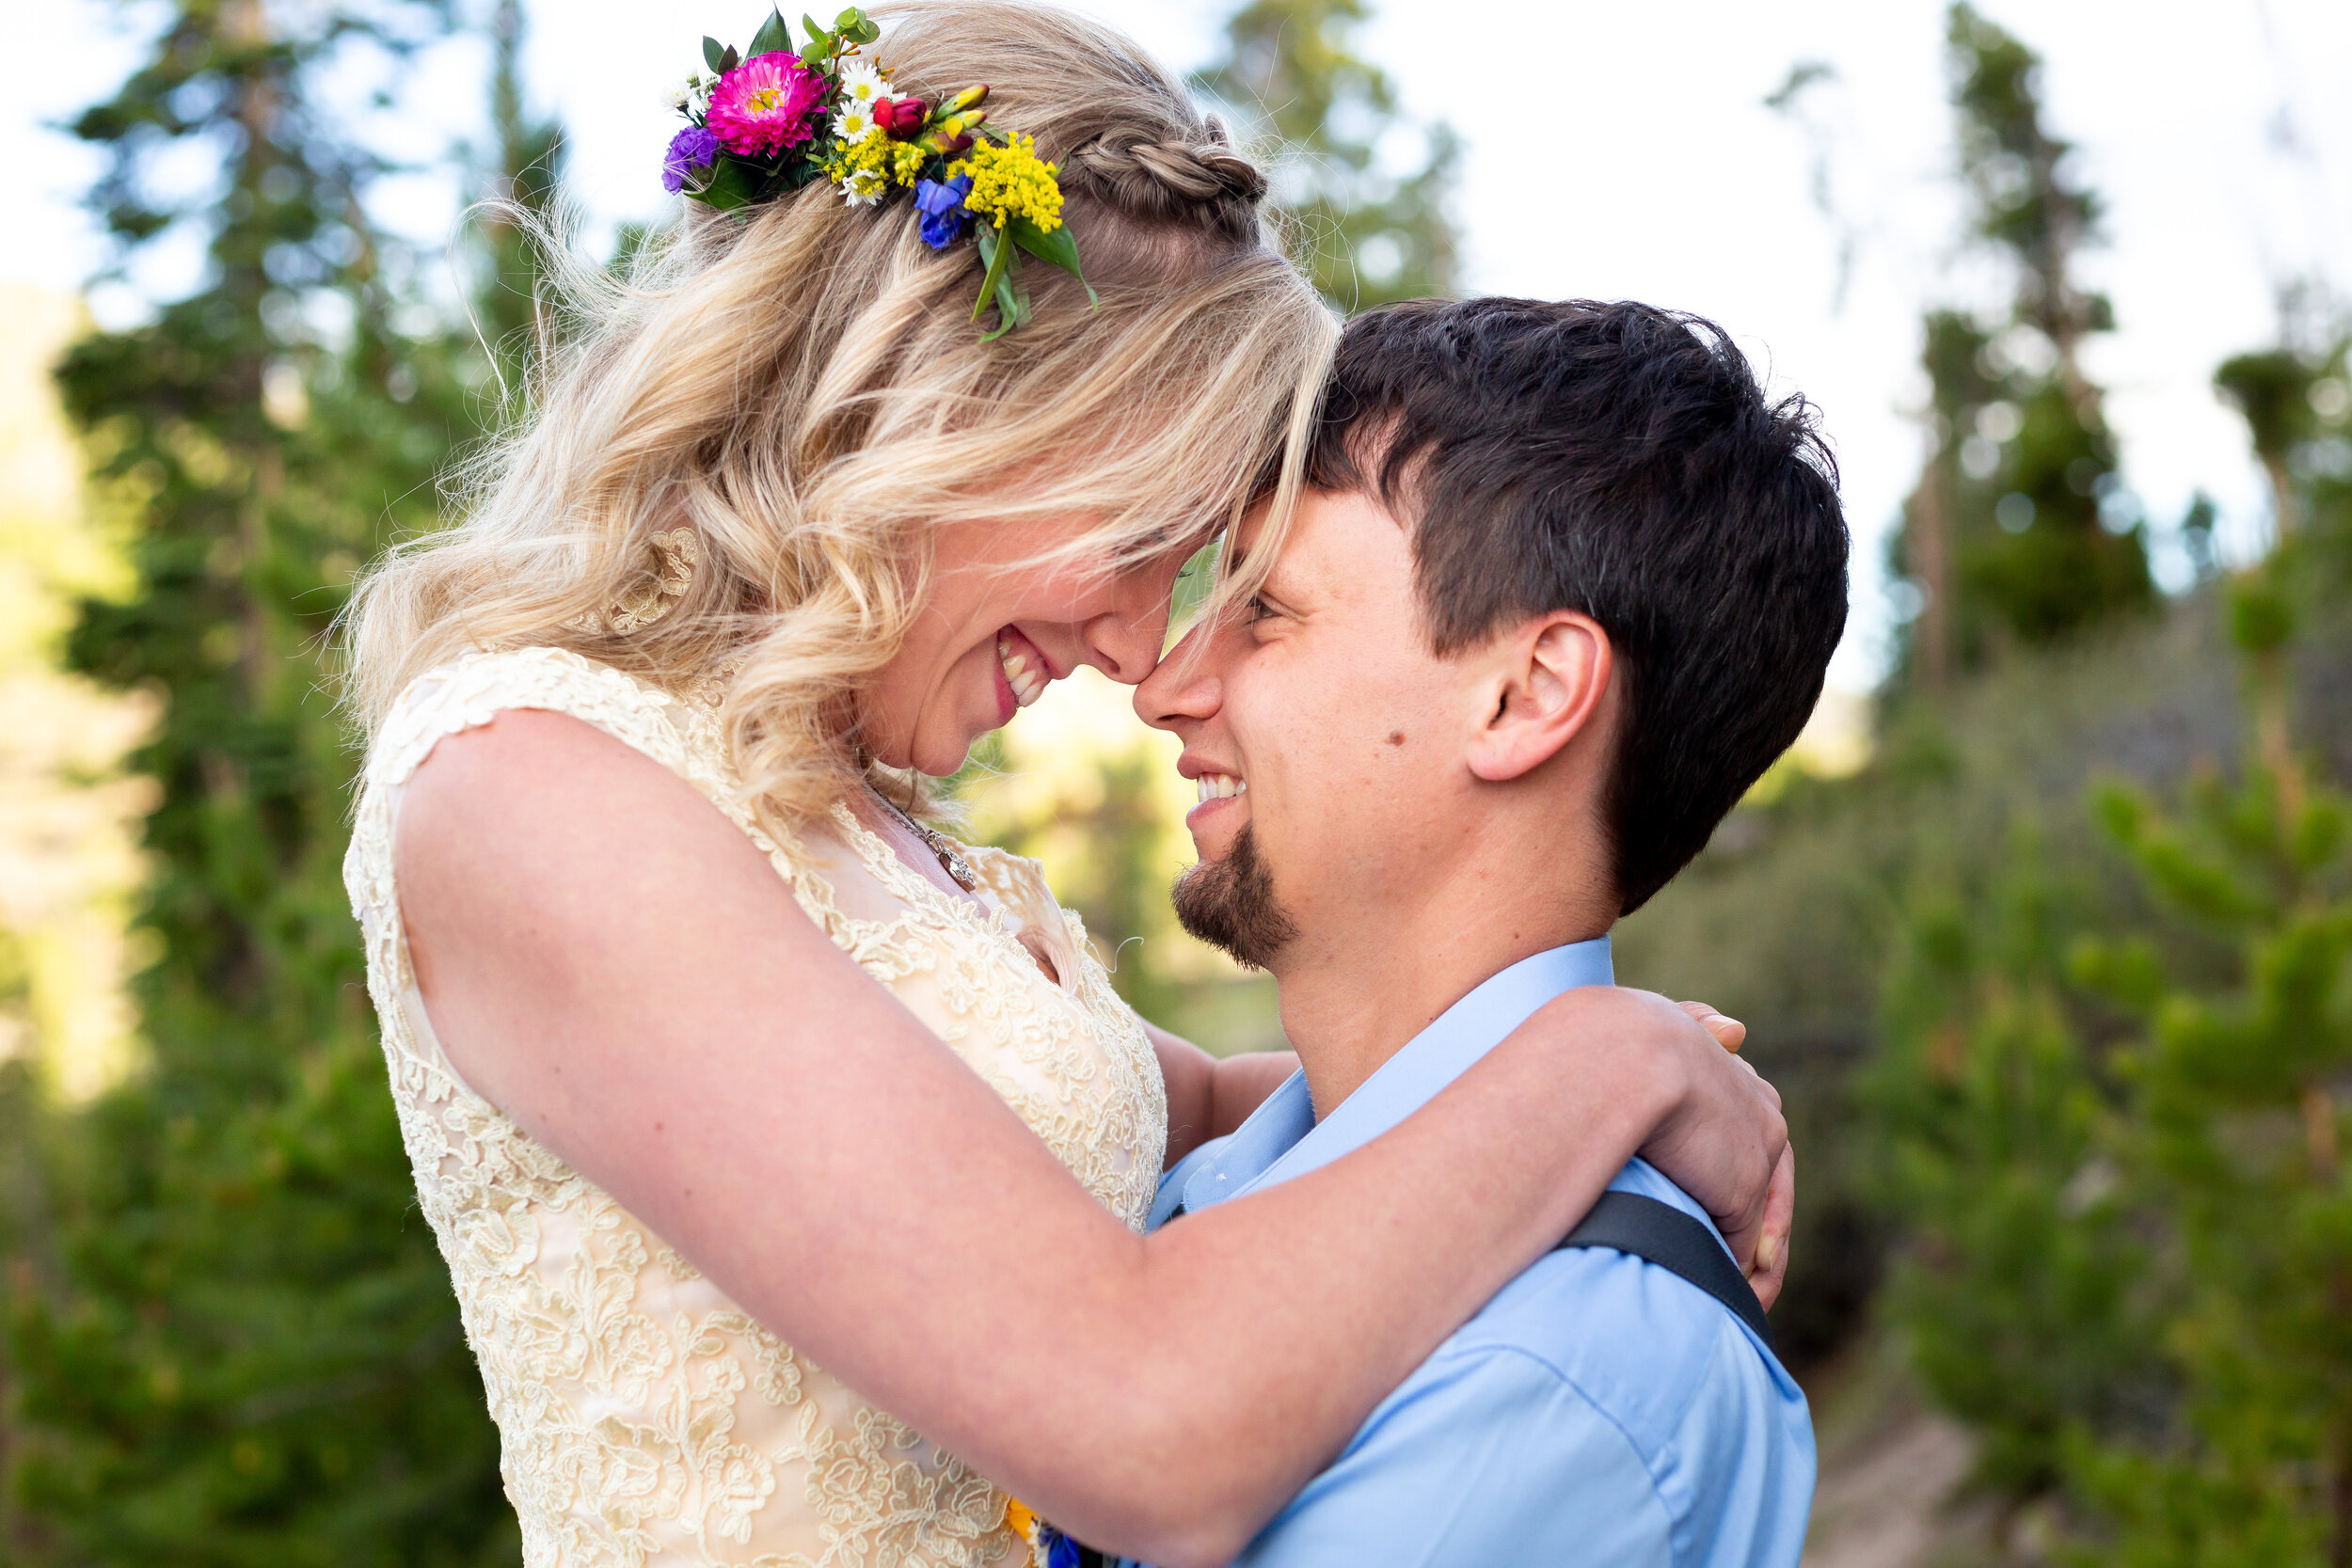 A Colorado Mountain Wedding for Kendra and Donald